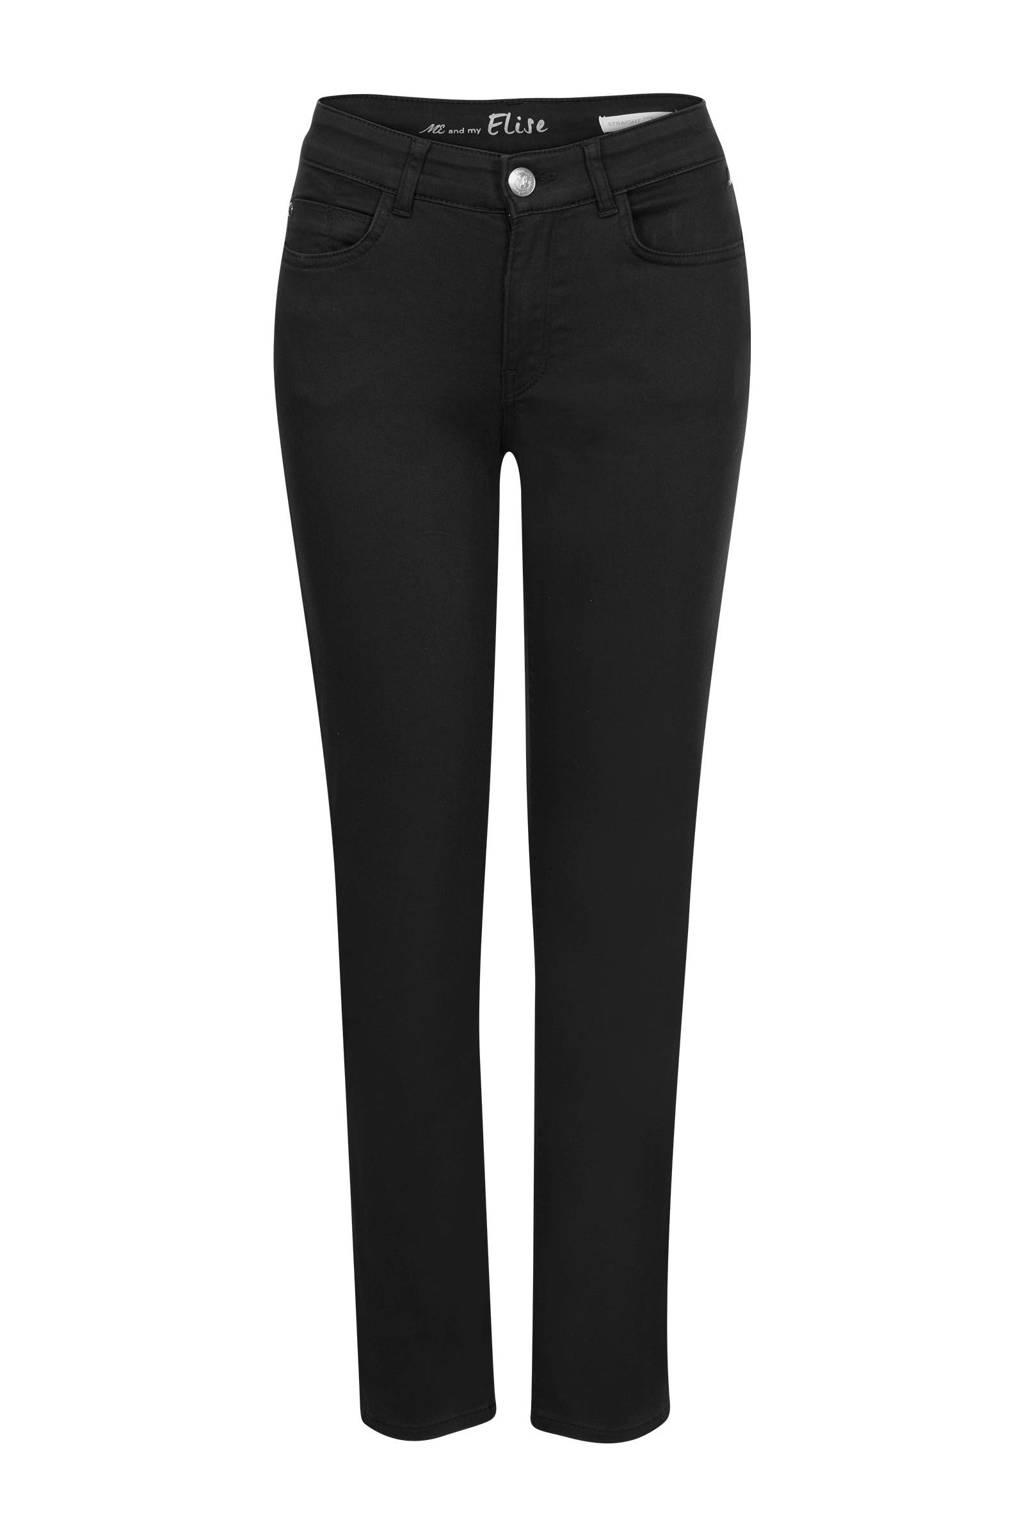 Miss Etam Regulier straight fit broek zwart, Zwart